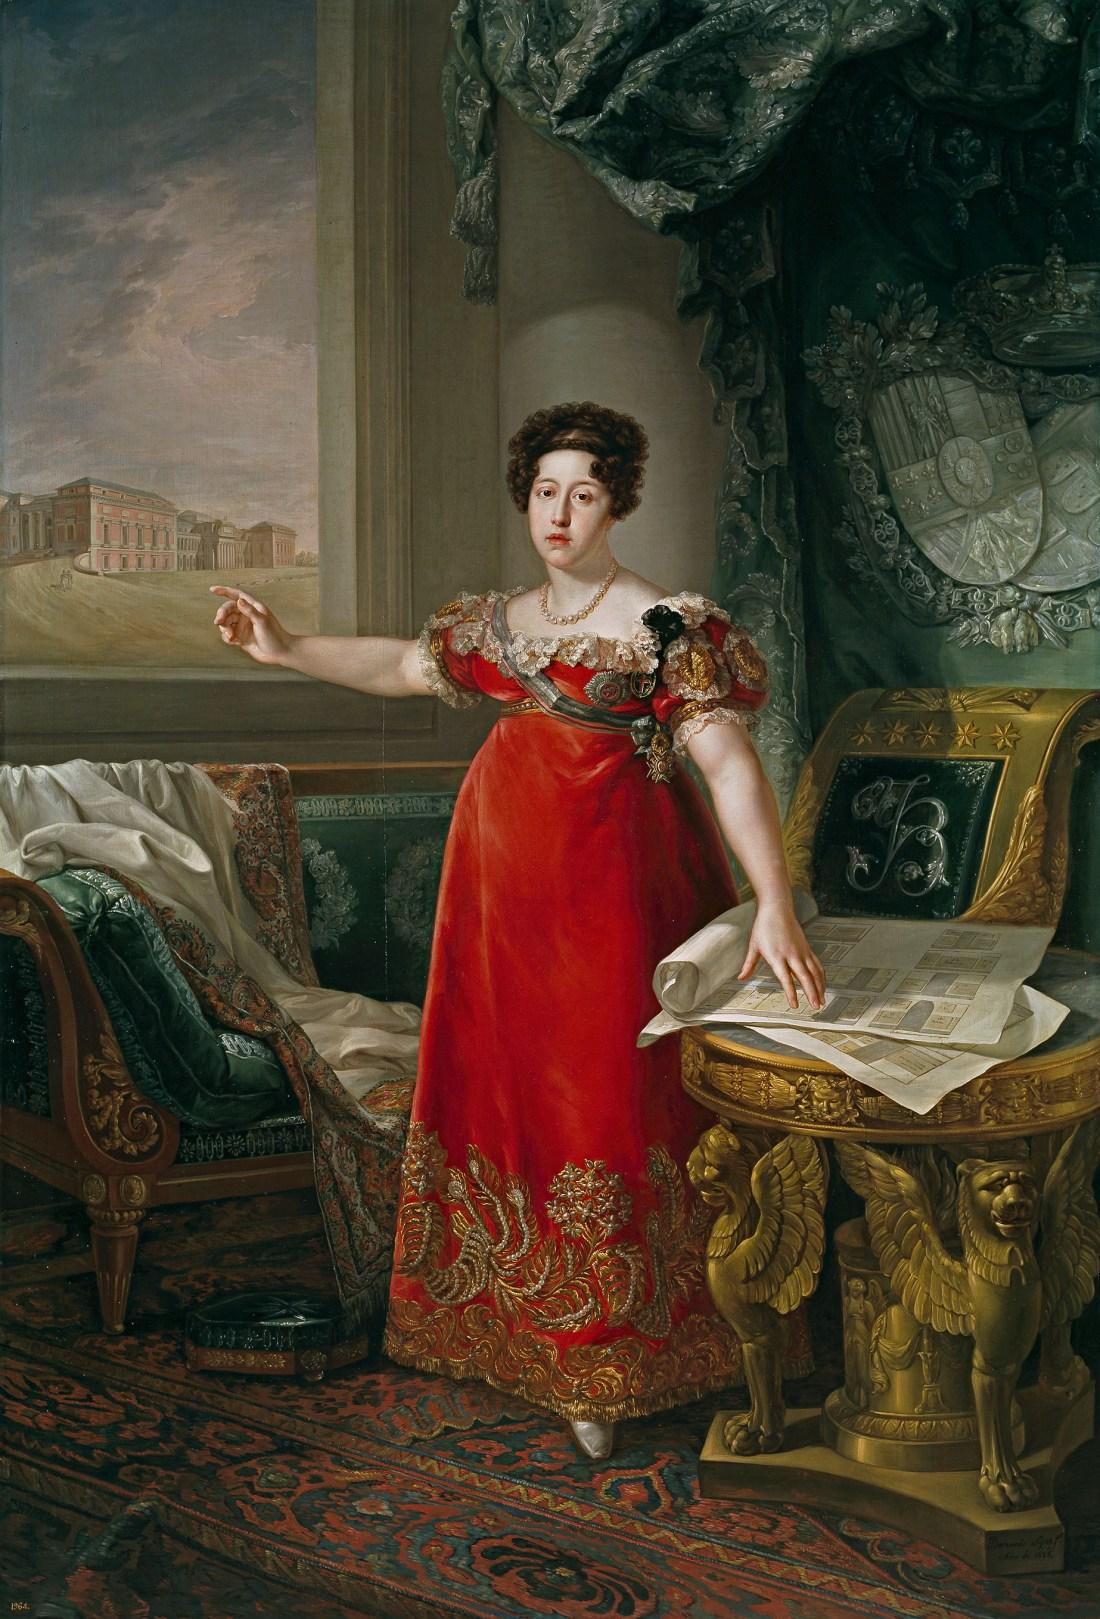 Maria_Isabel_of_Portugal_in_front_of_the_Prado_in_1829_by_Bernardo_López_y_piquer